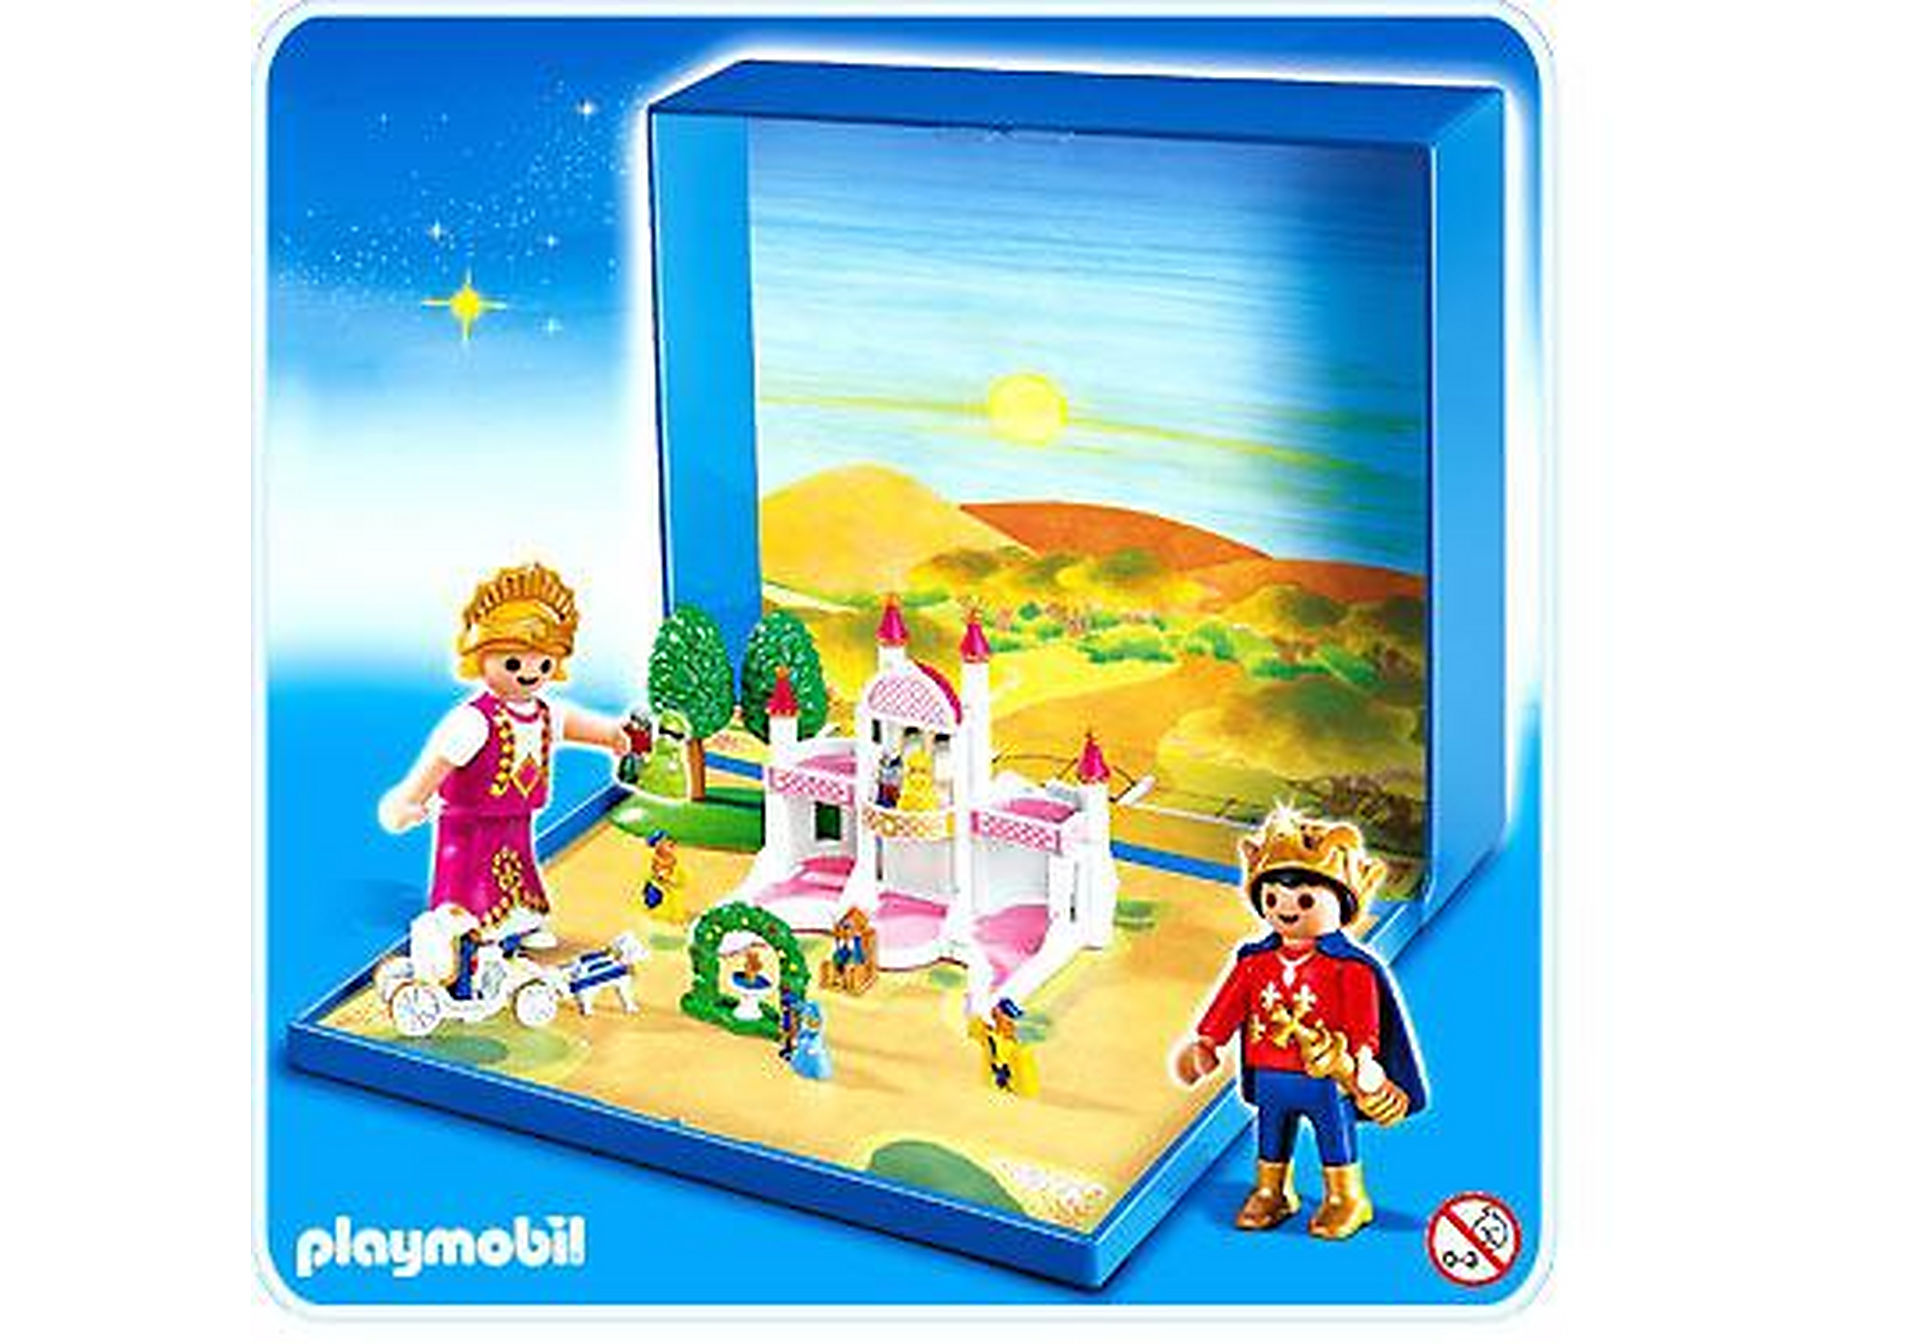 http://media.playmobil.com/i/playmobil/4330-A_product_detail/Micro Playmobil Château de Princesse